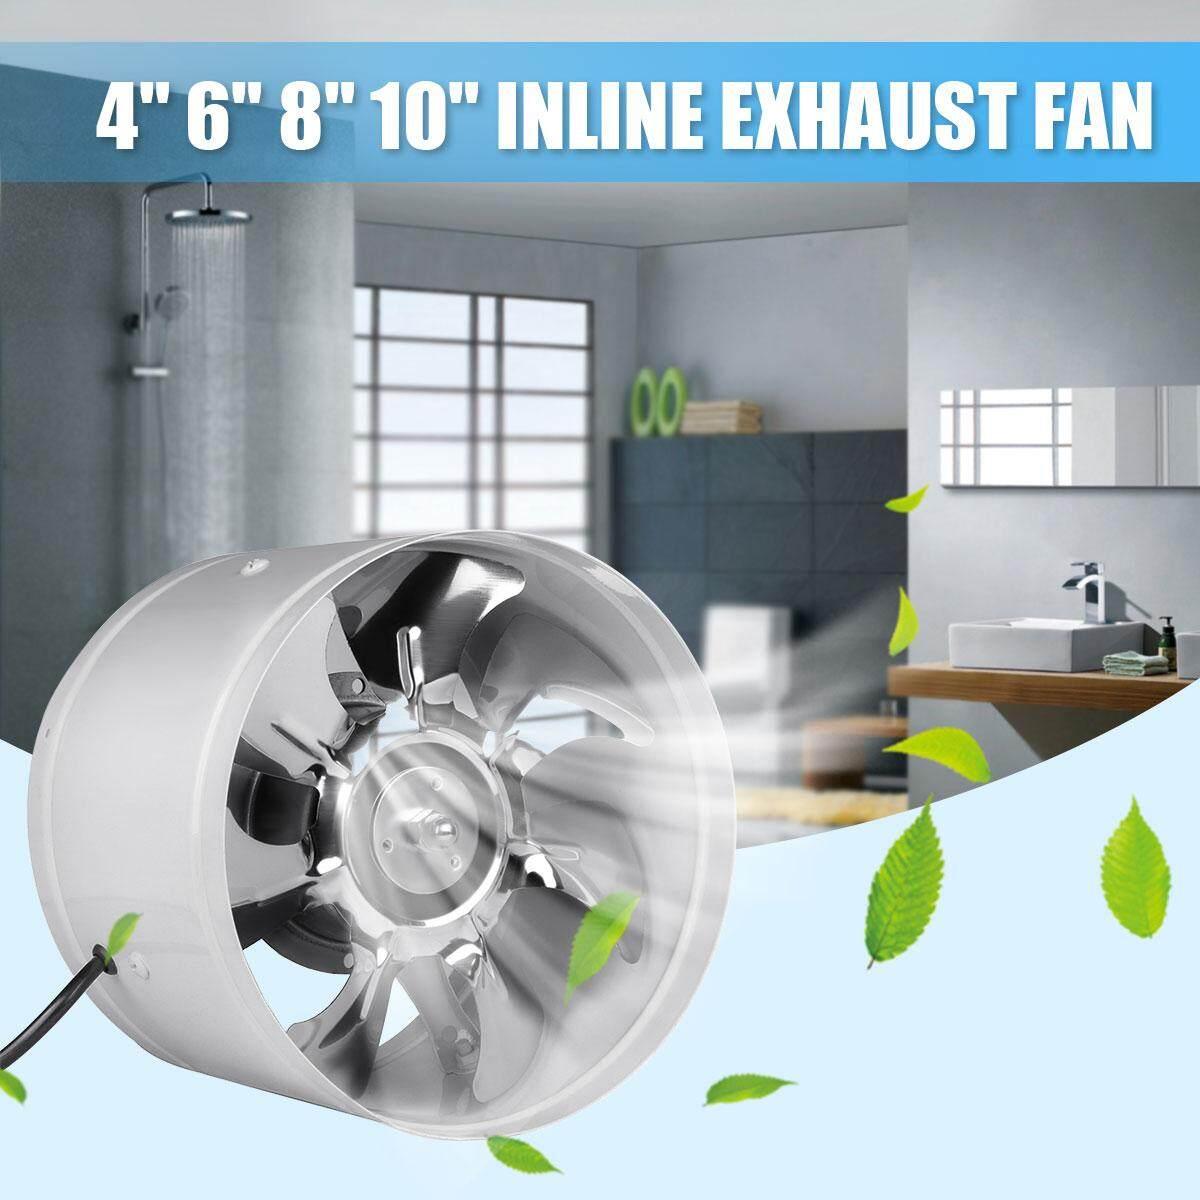 Hình ảnh Duct Fan Booster Exhaust Ventilator Ventilation Vent Air 4''20W